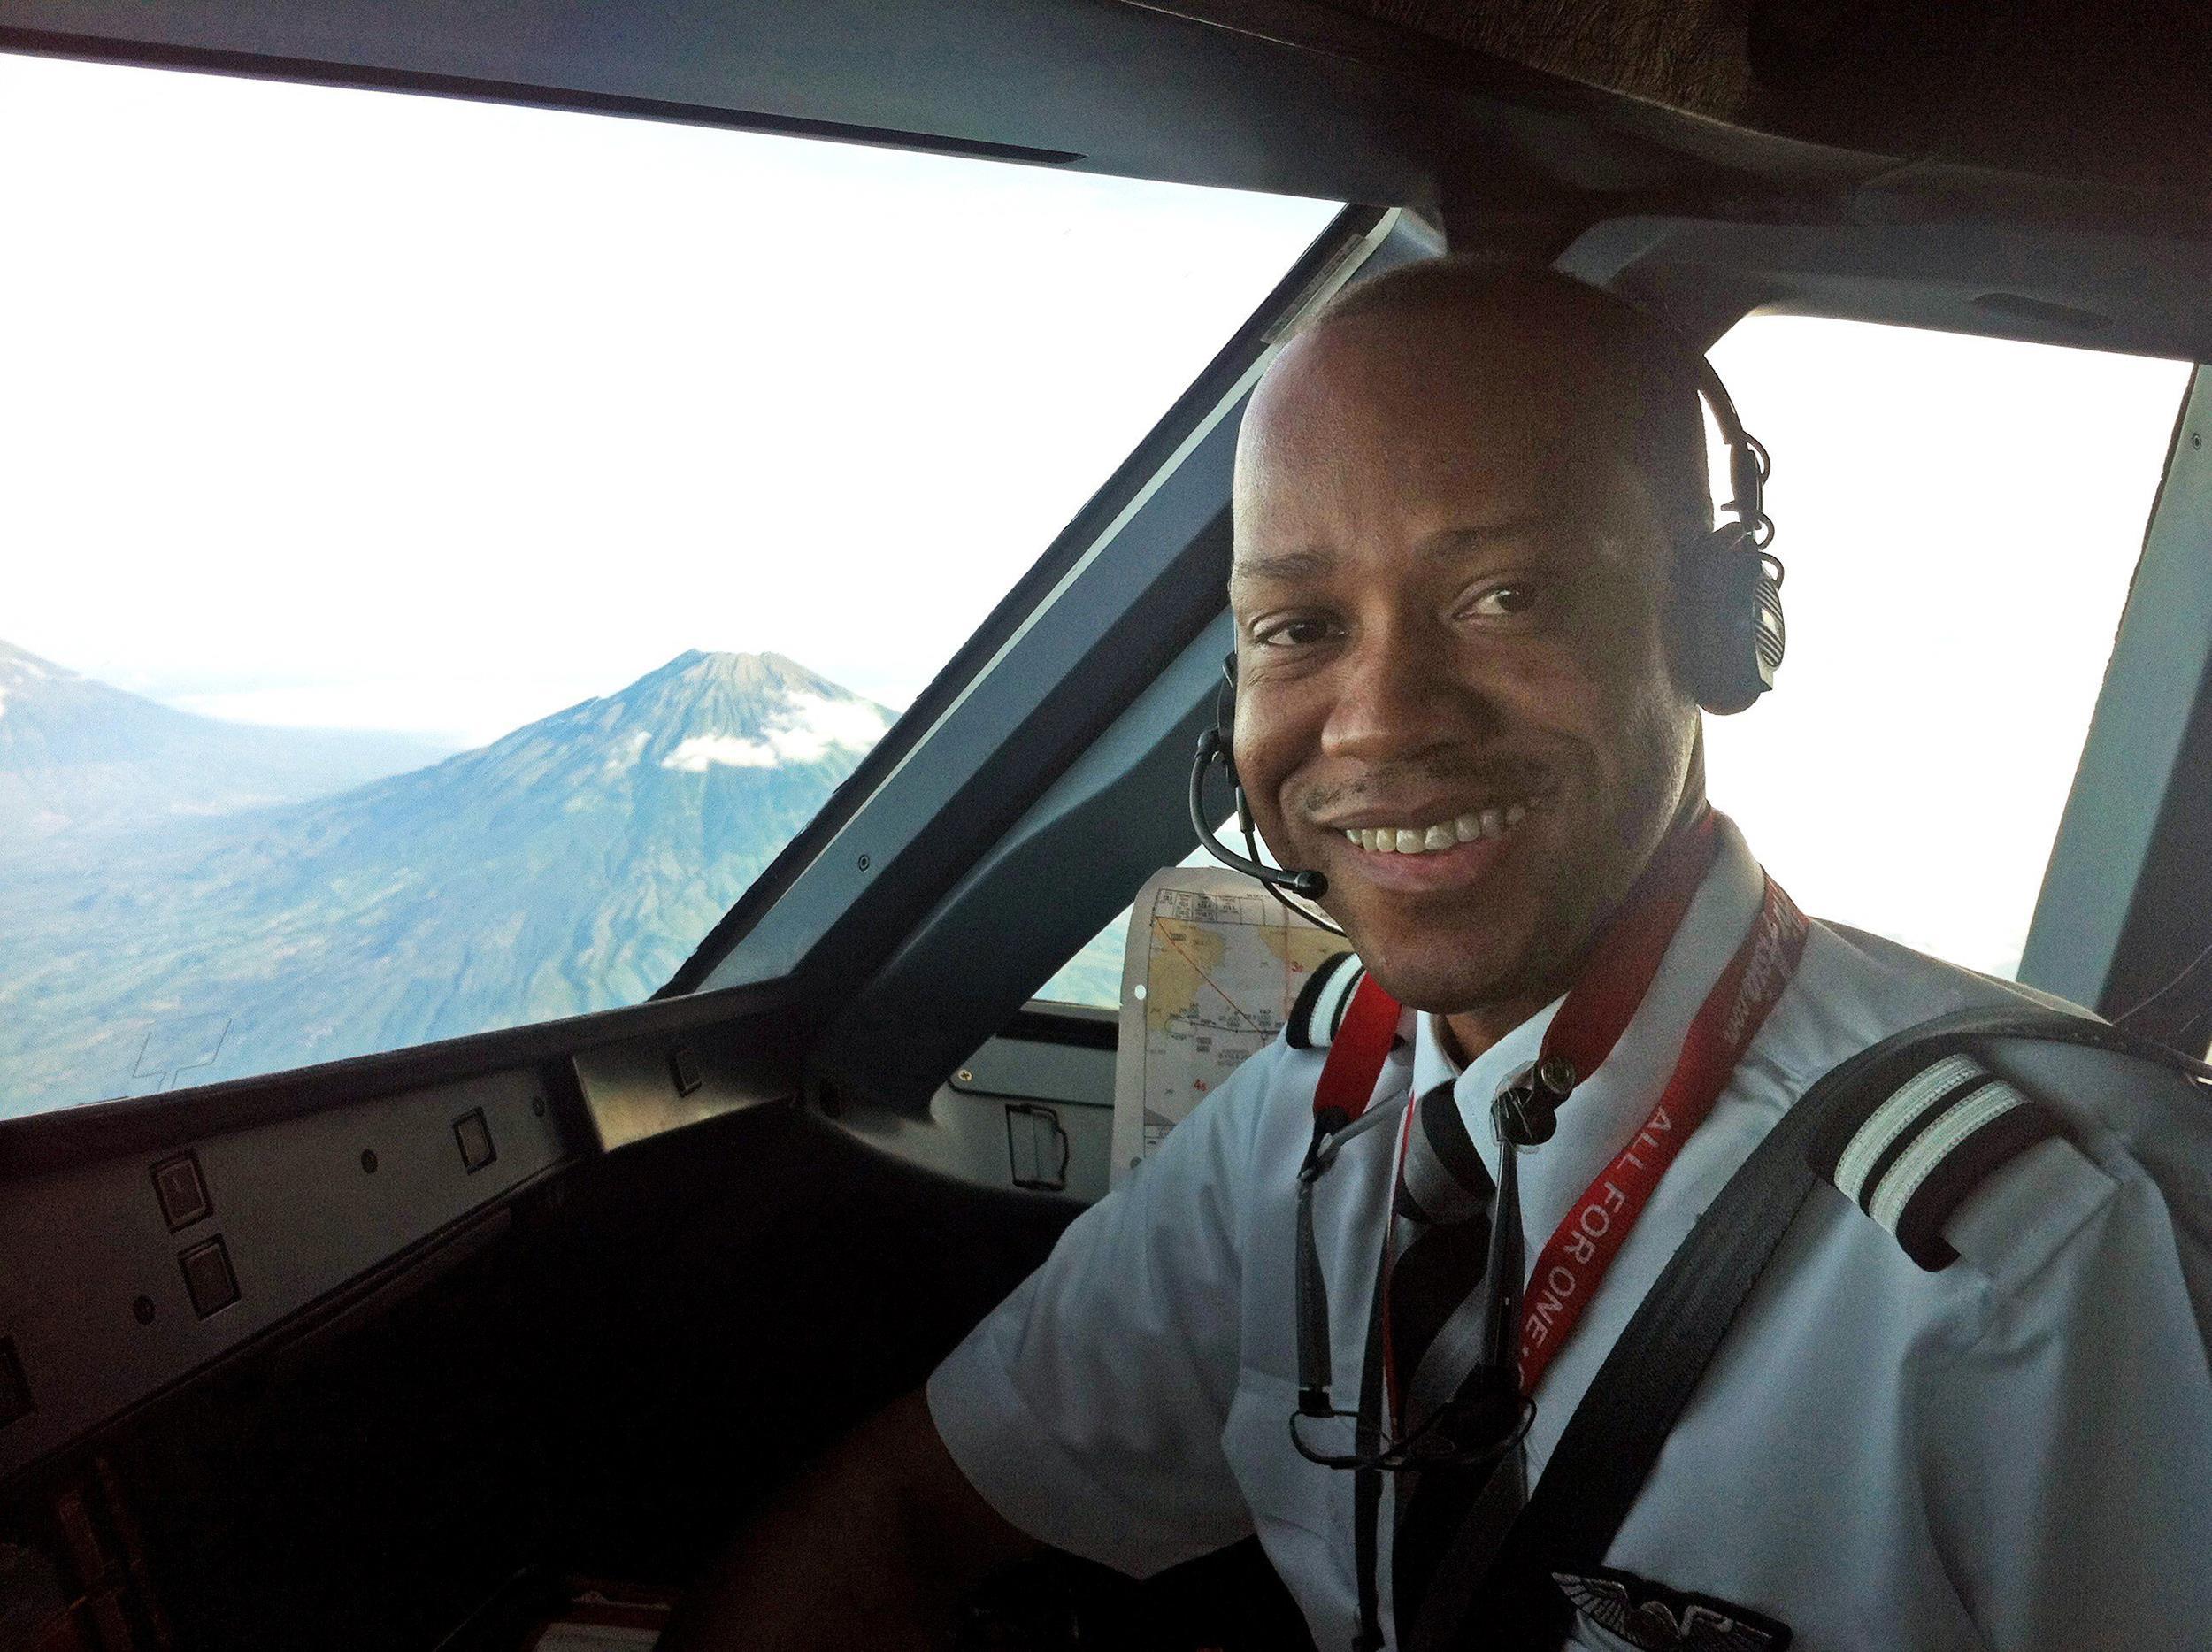 airasia flight 8501 simulation dating